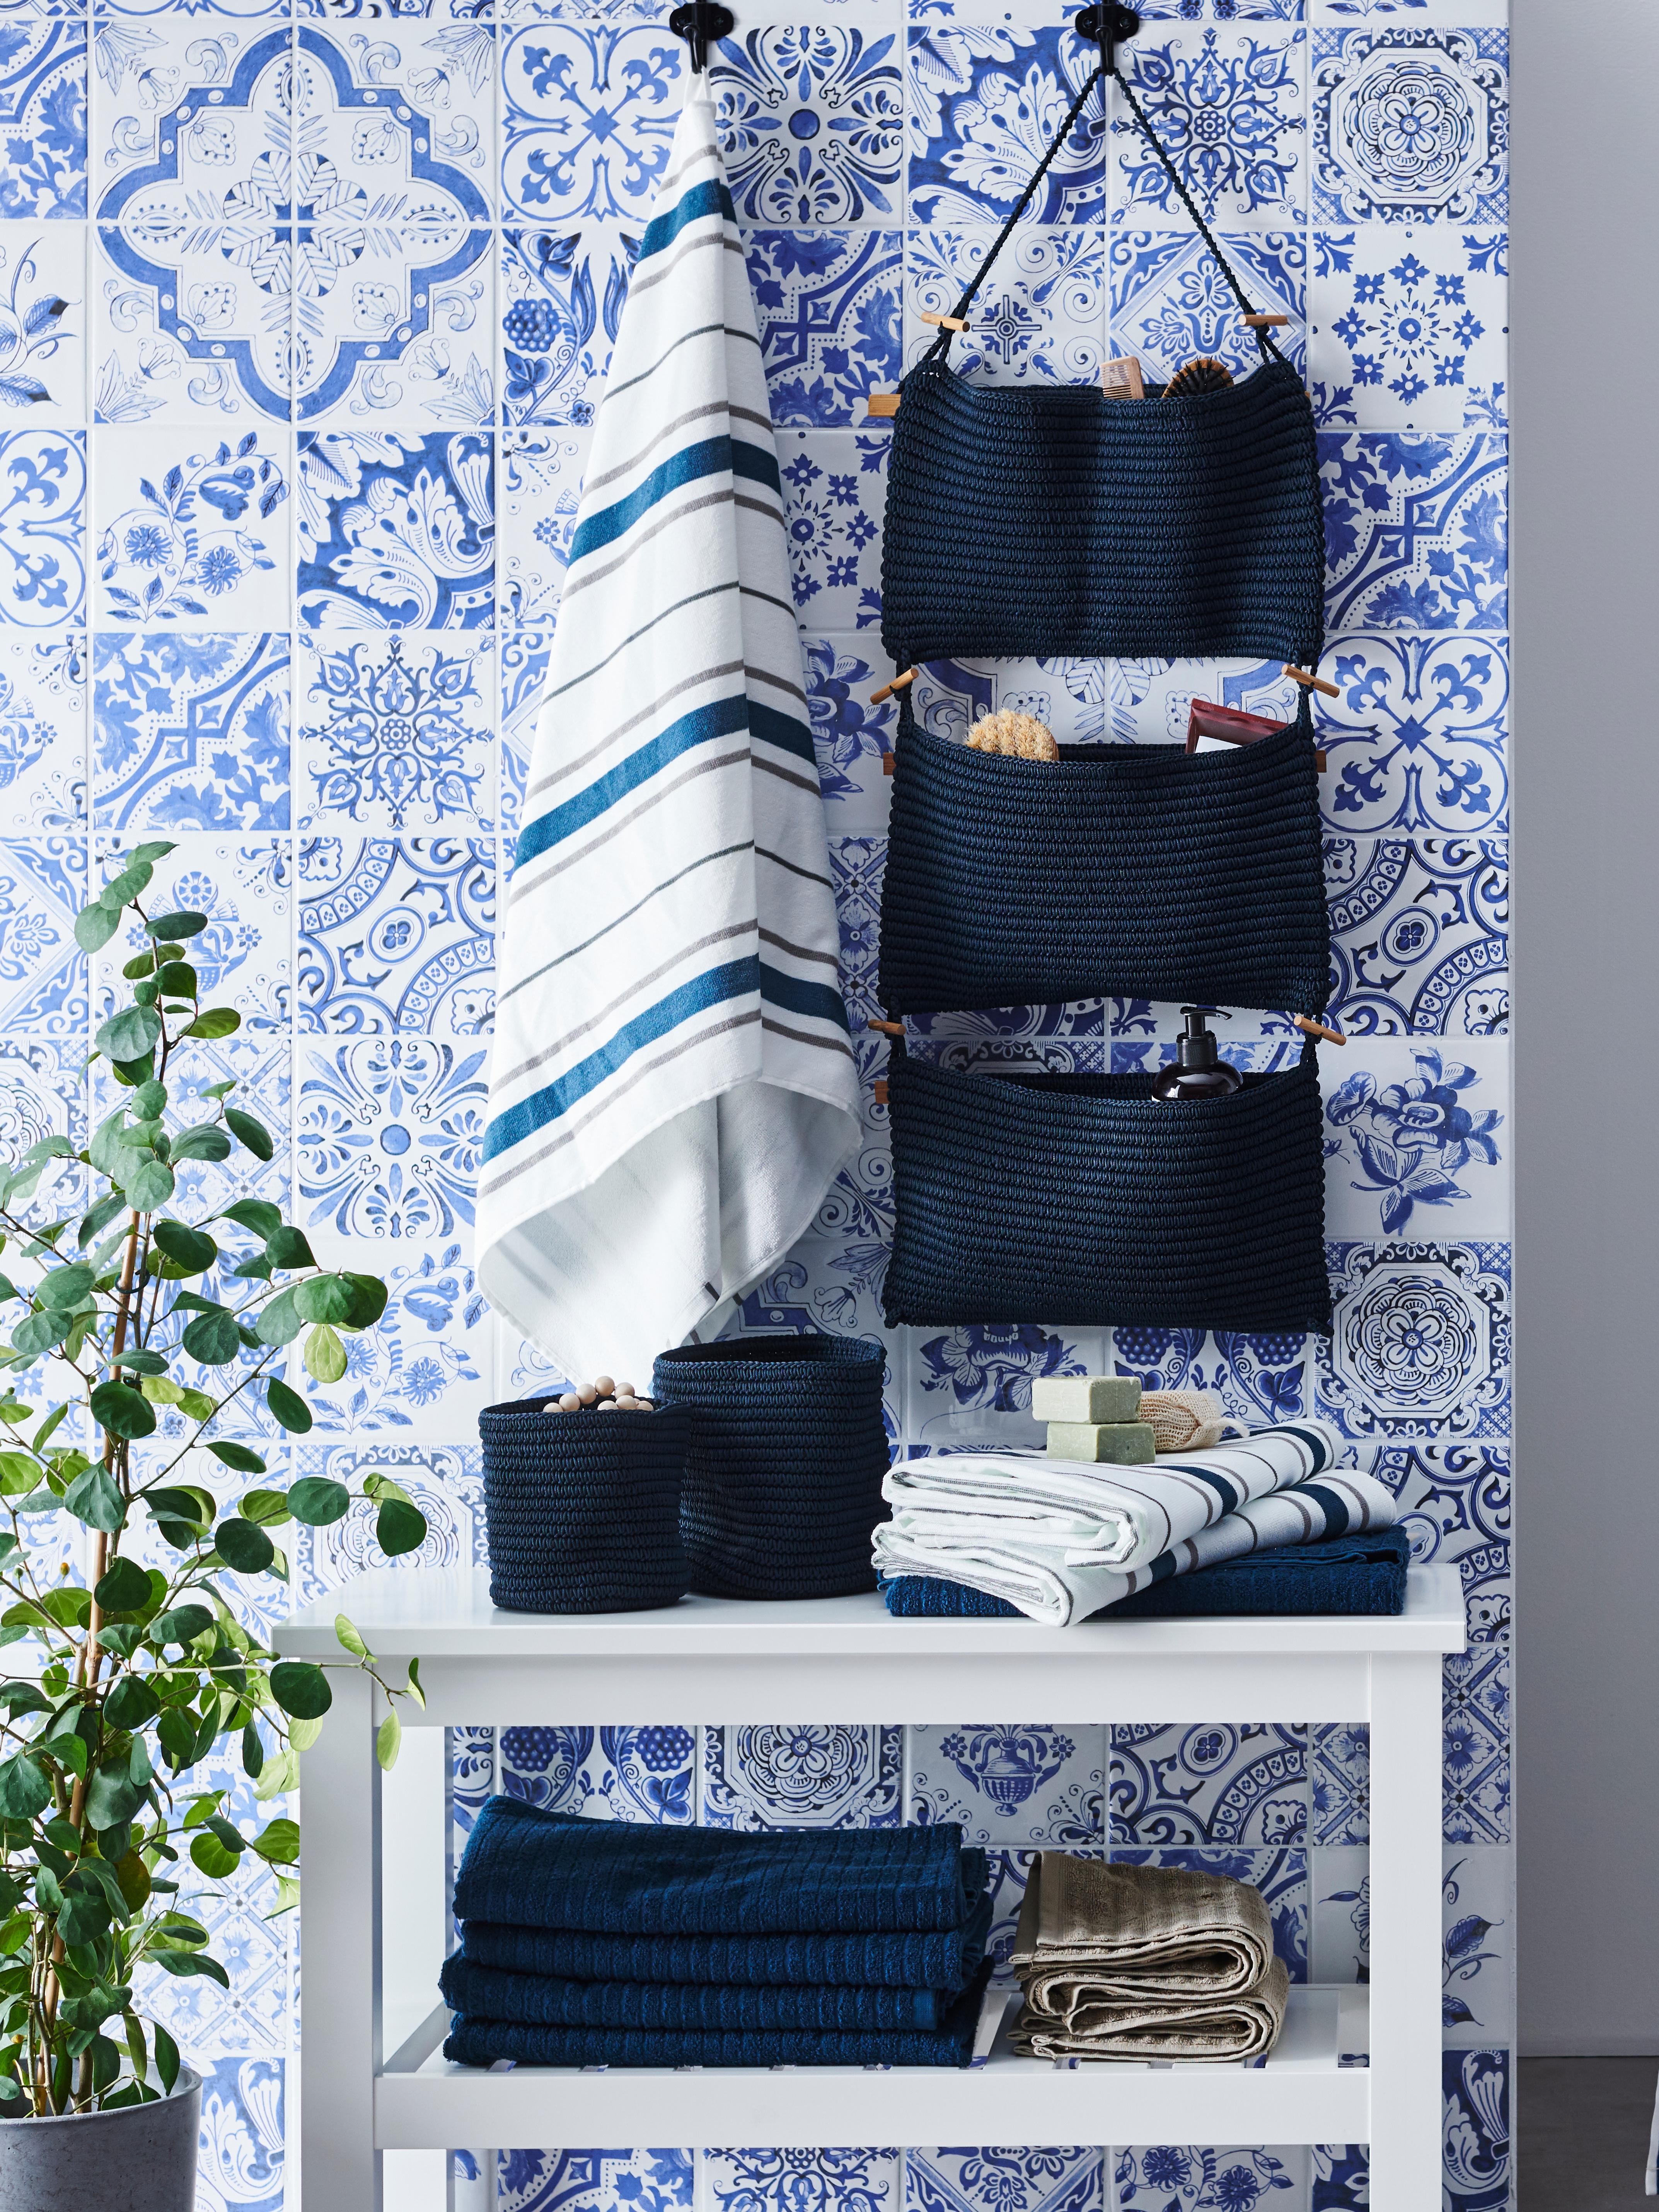 A blue NORDRANA hanging storage and an OTTSJÖN bath towel on a tiled bathroom wall with storage baskets underneath.